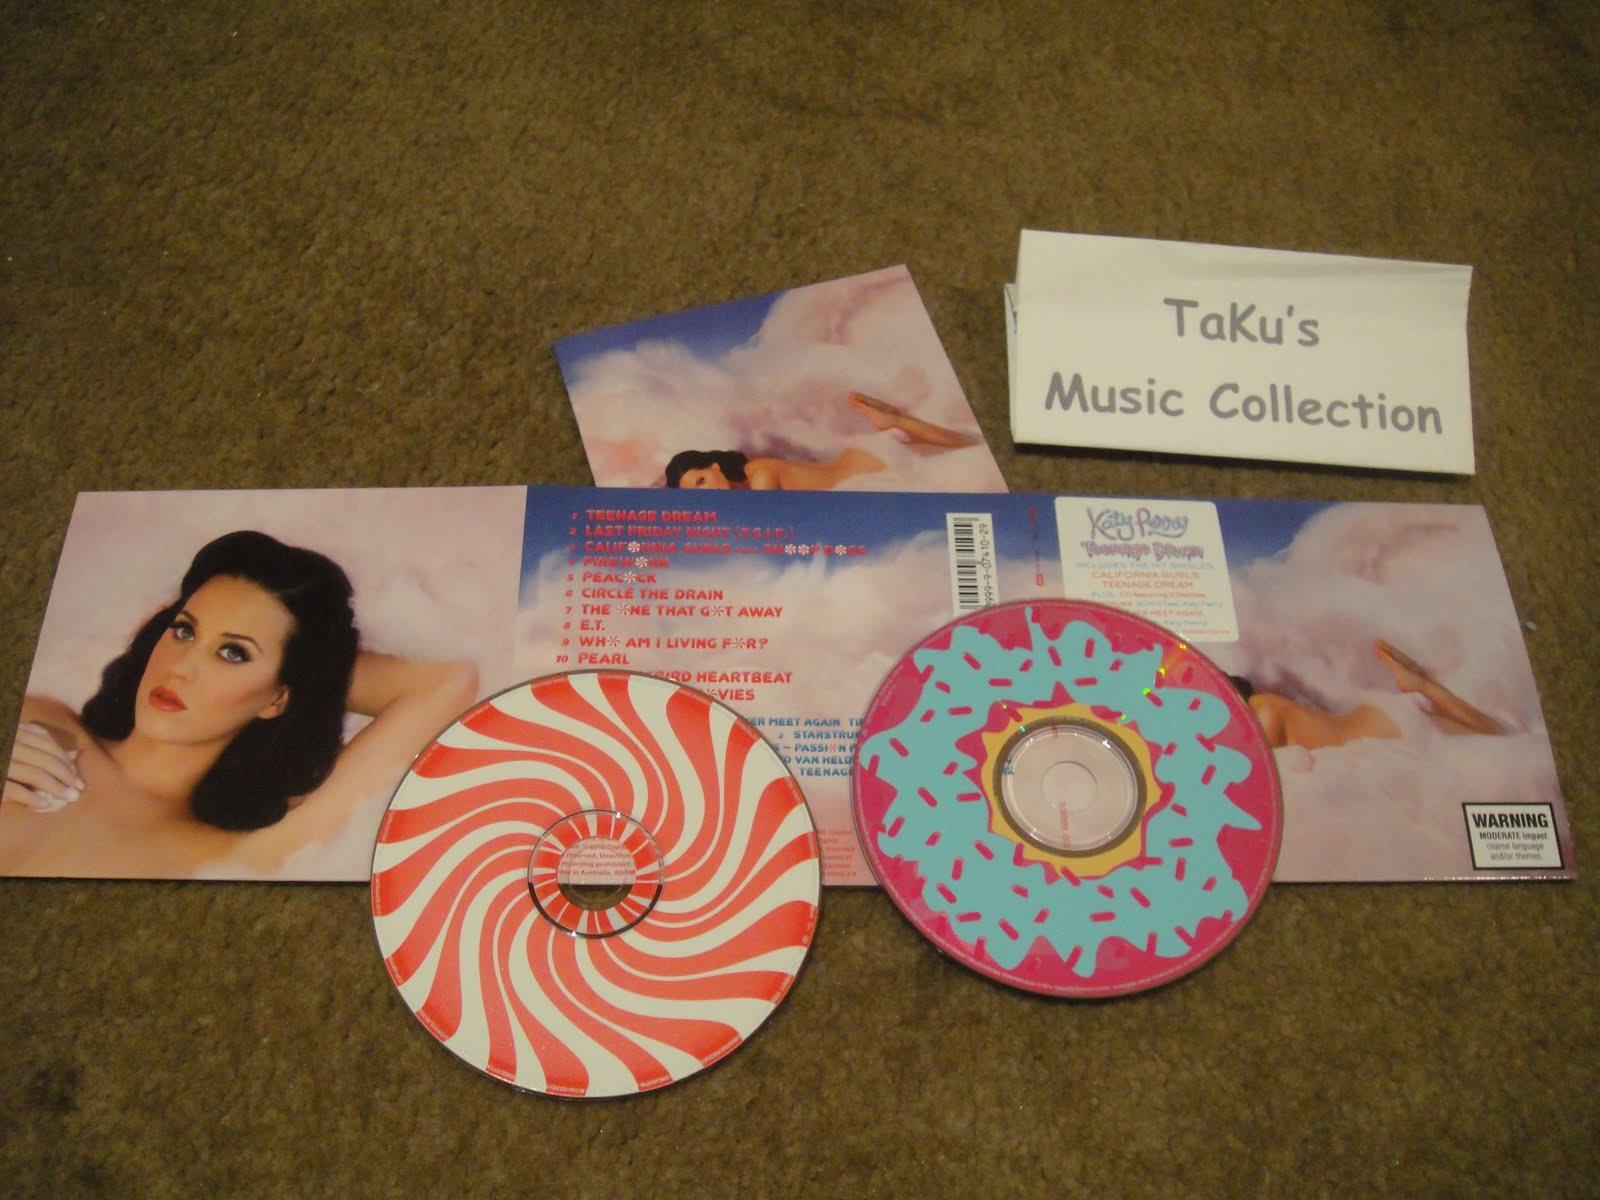 http://2.bp.blogspot.com/_bI5-8YnkkFA/THiqoMe3hYI/AAAAAAAAEqY/AO-jY6AB8BE/s1600/00-katy_perry-teenager_dream_(deluxe_edition_bonus_cd)-2010-taku.jpg